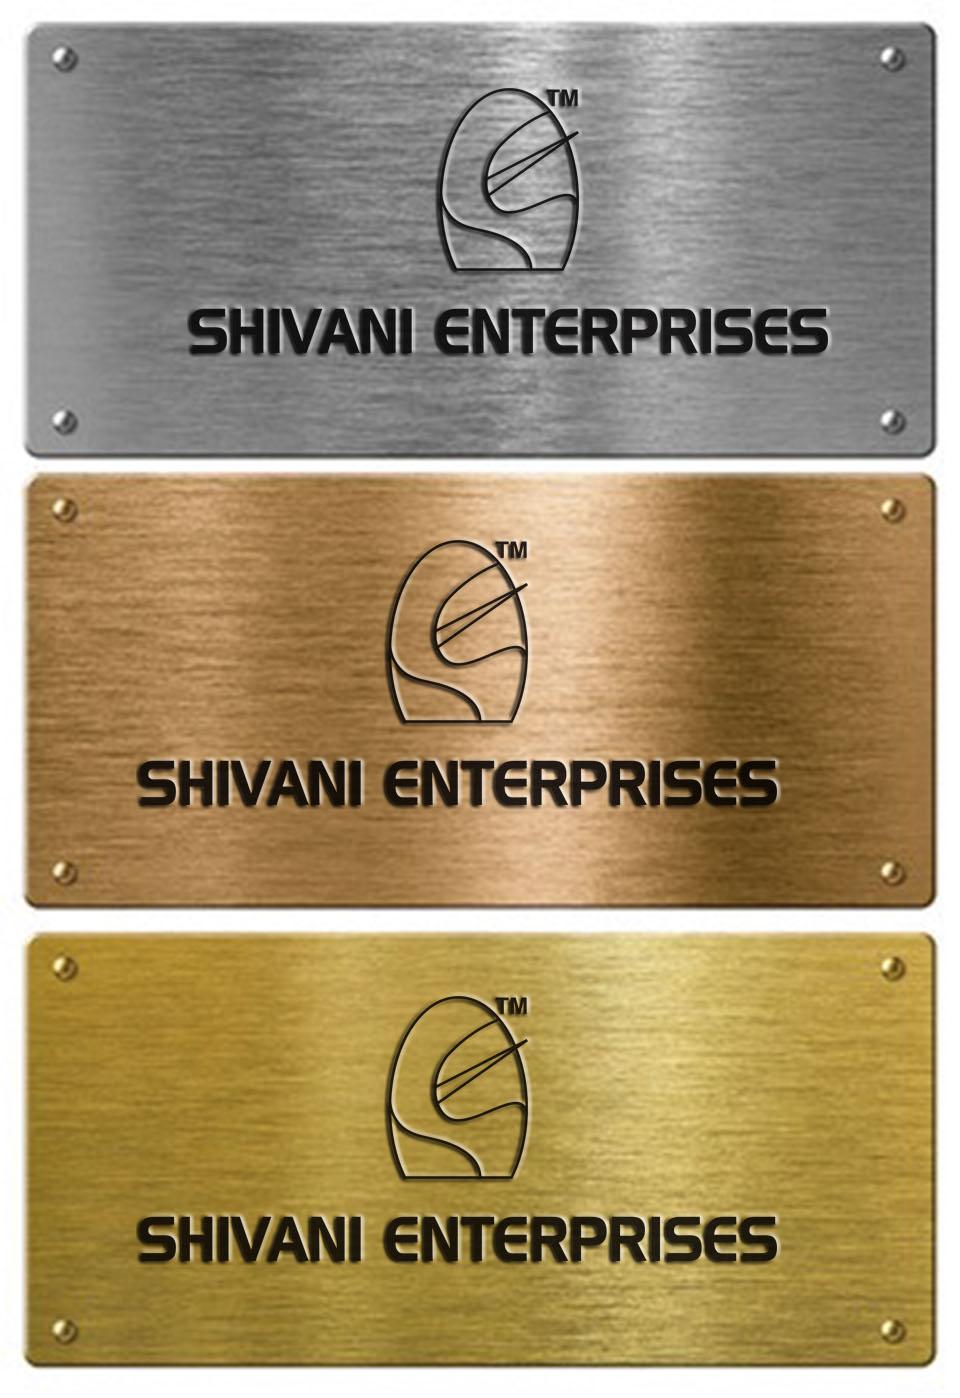 Name Plate Maker in Munirka, Delhi NCR India.